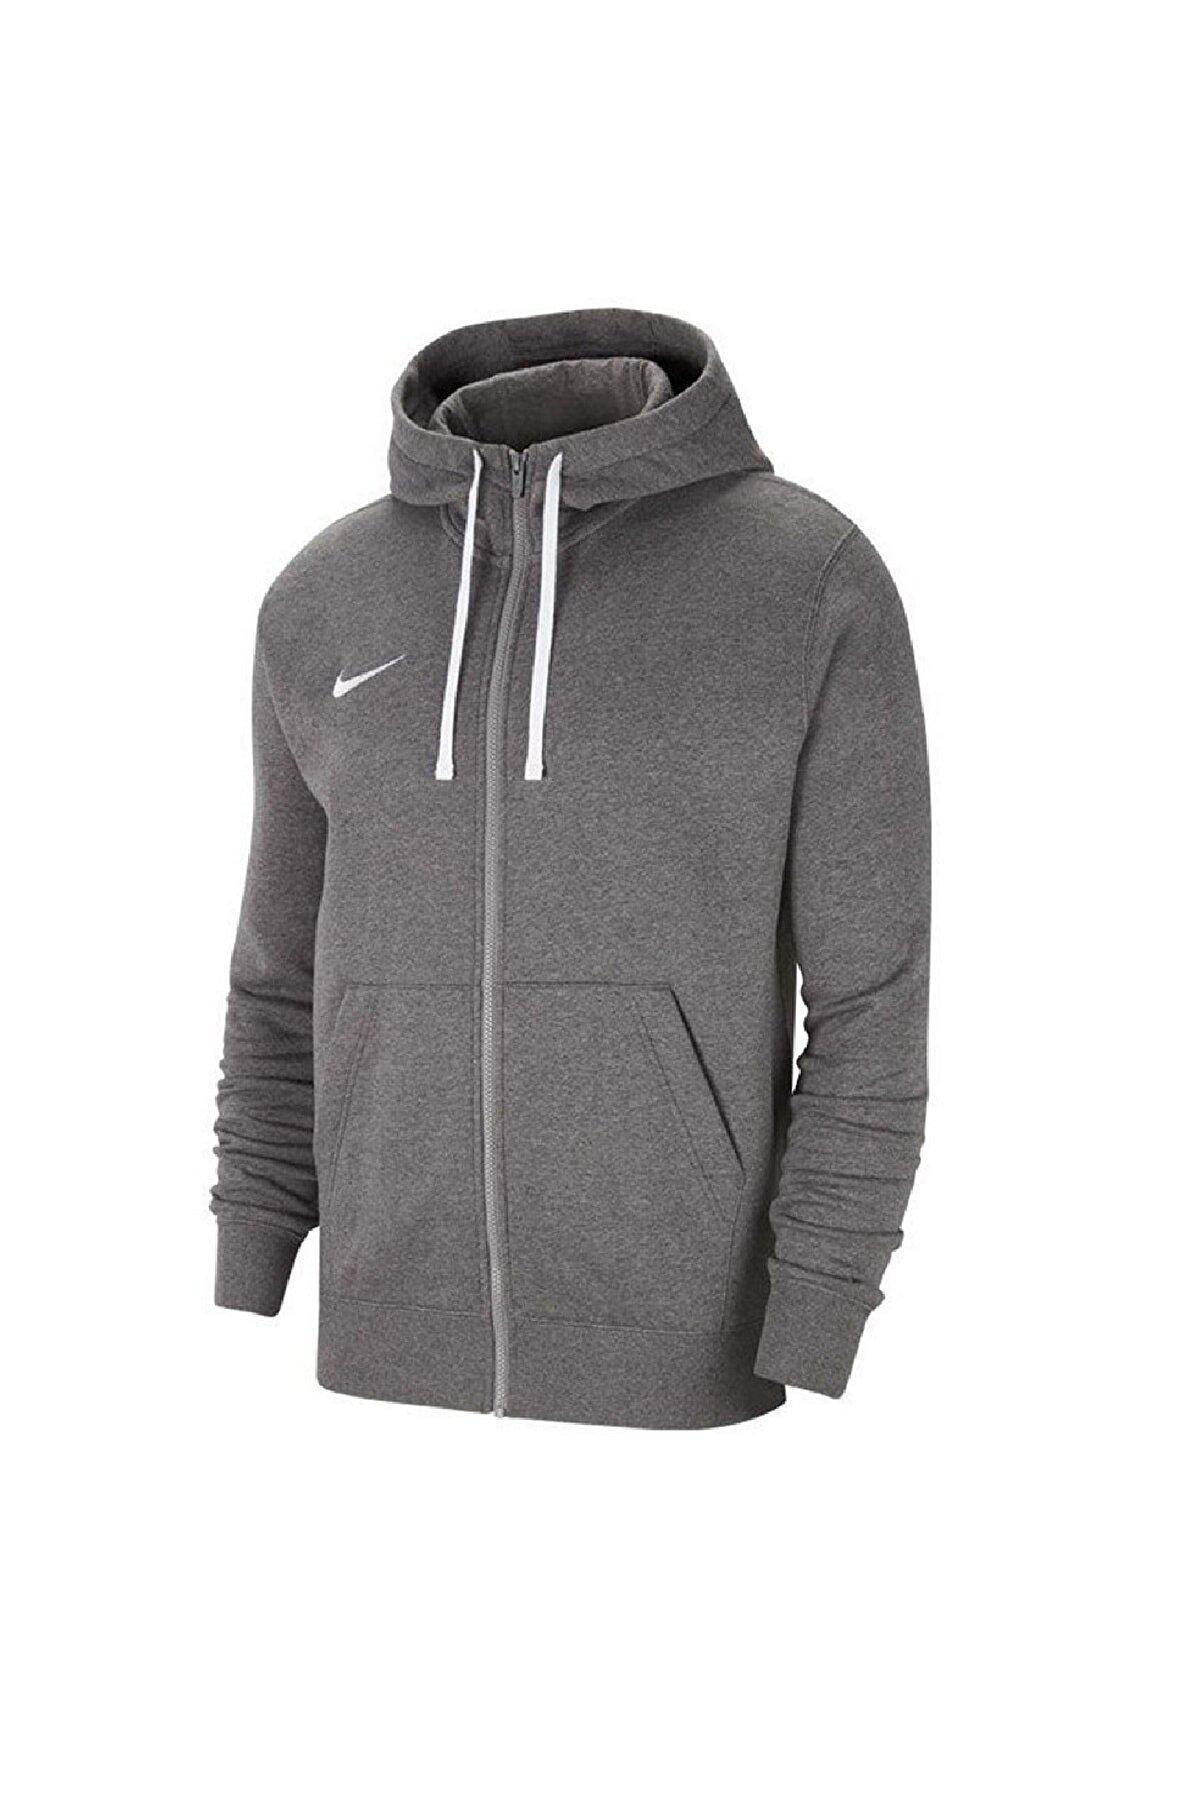 Nike Erkek Spor Sweatshirt - Dry Park - CW6887-071